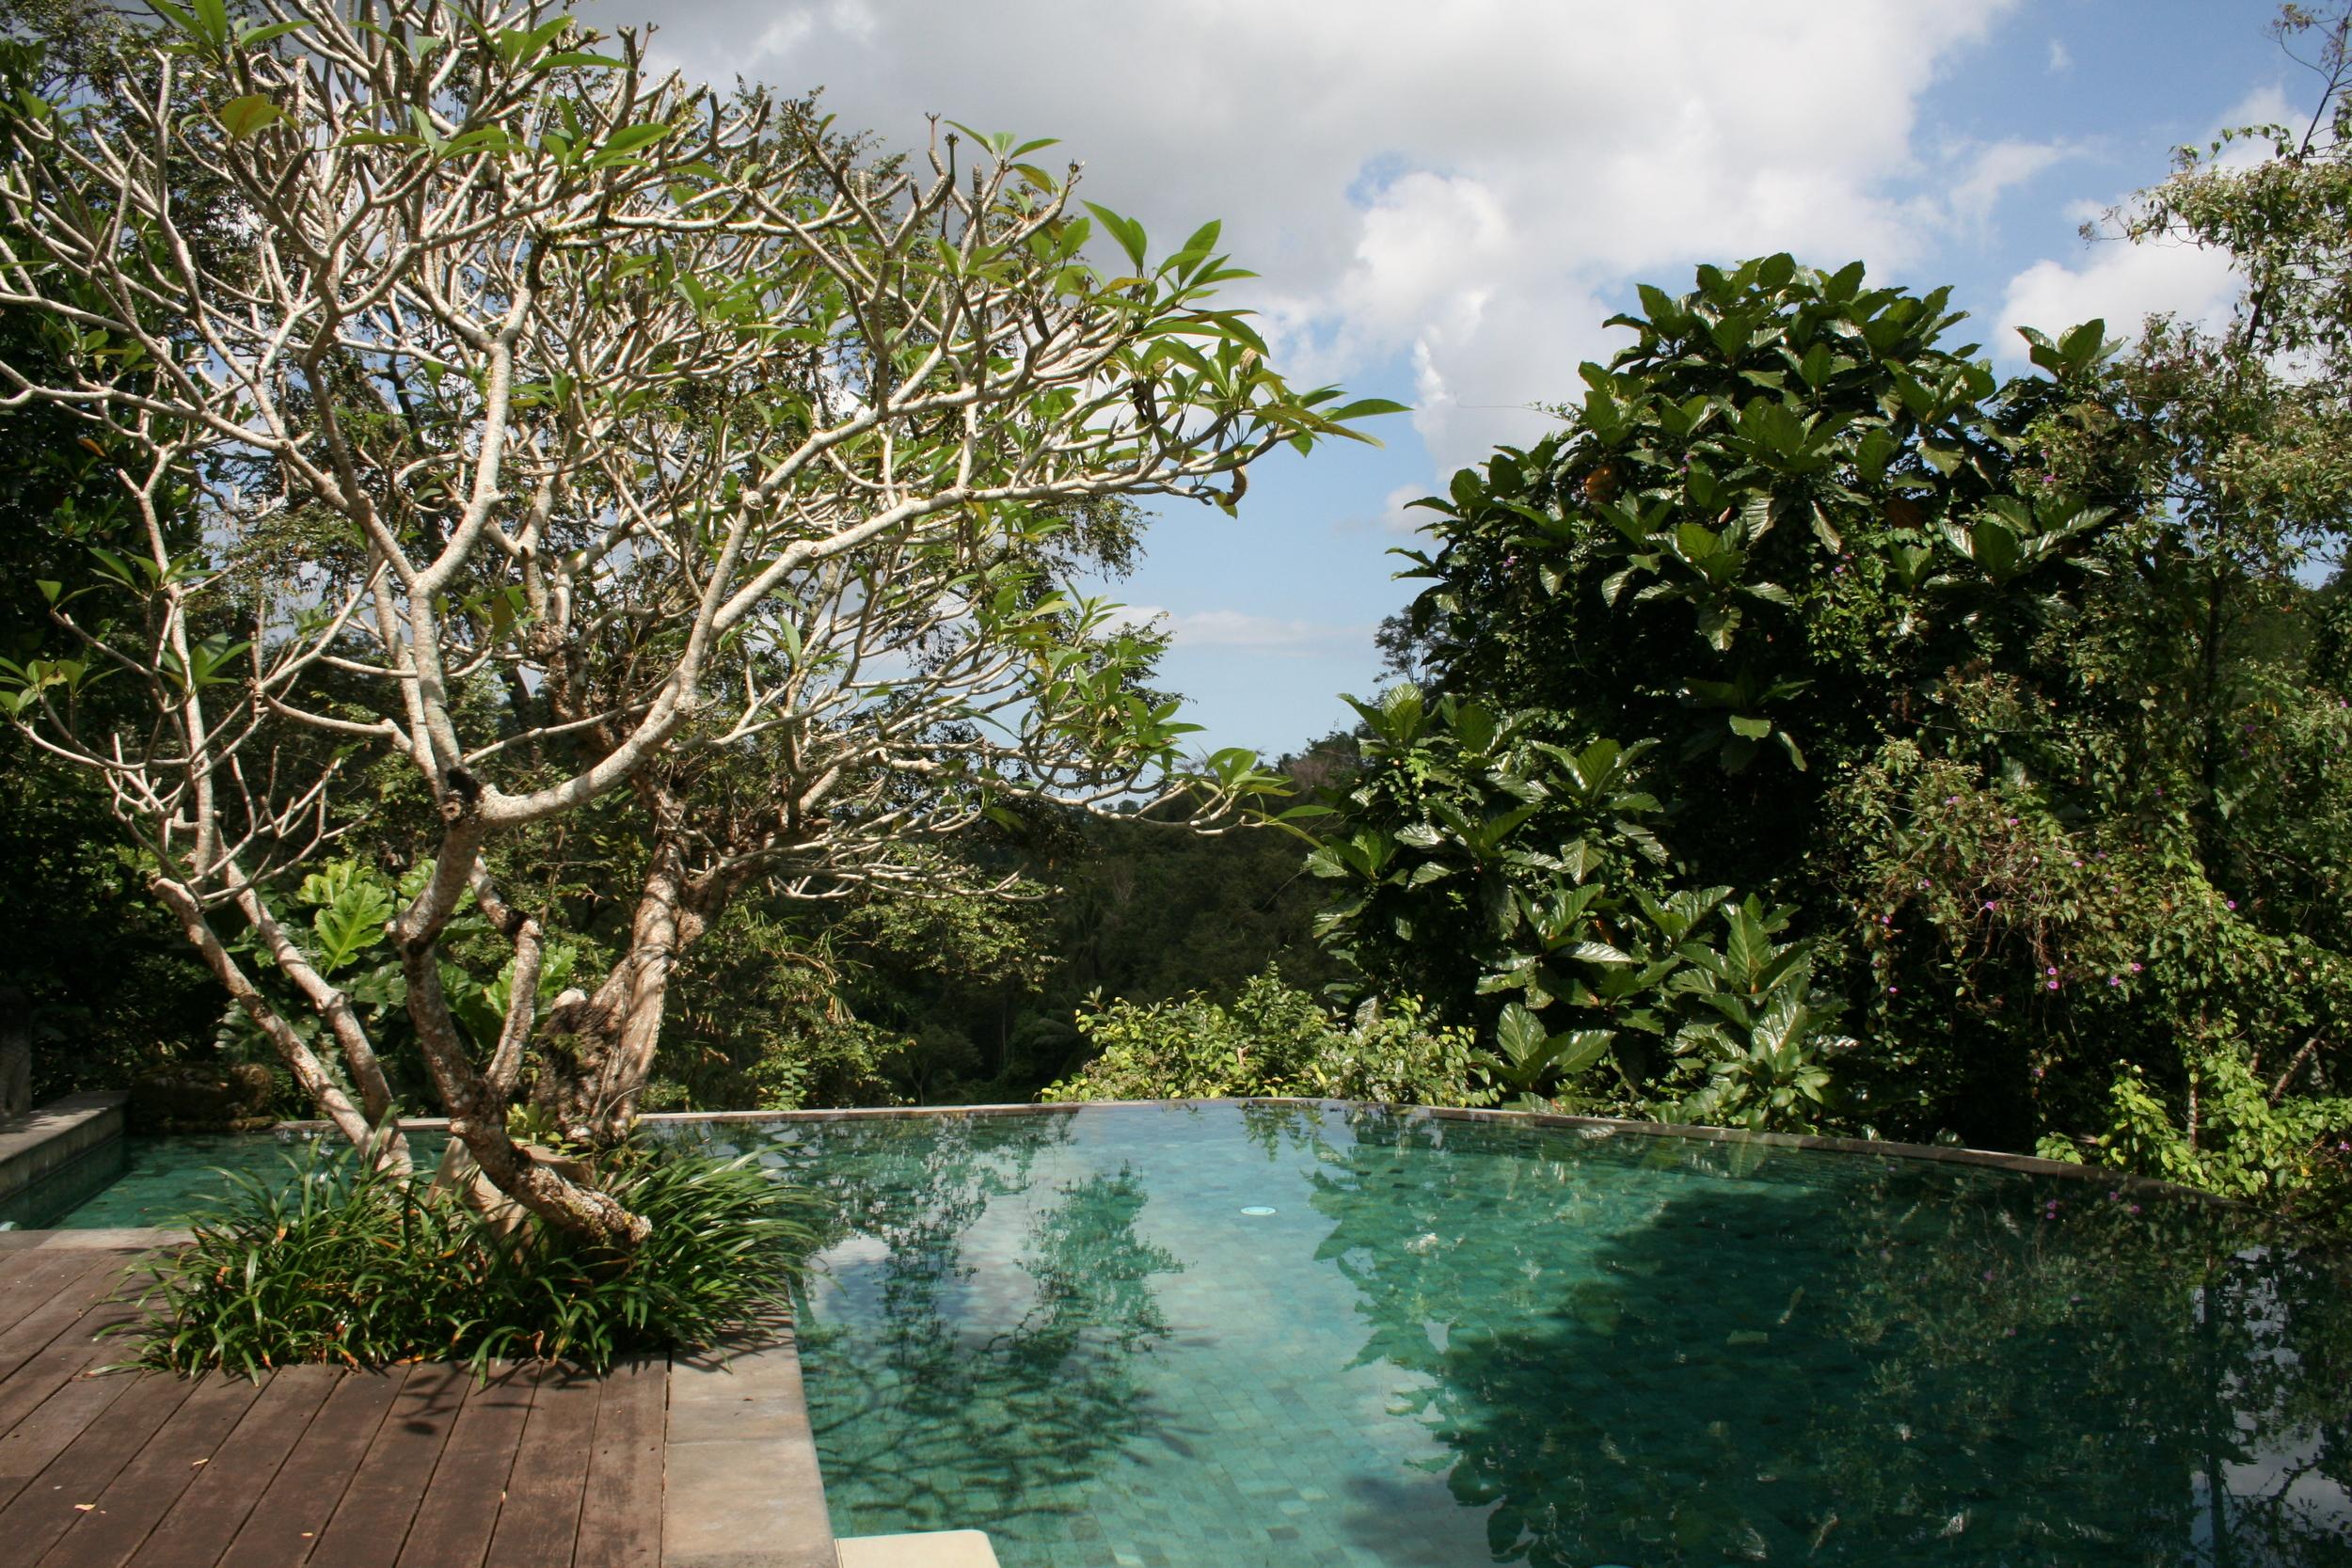 Bali pool.JPG